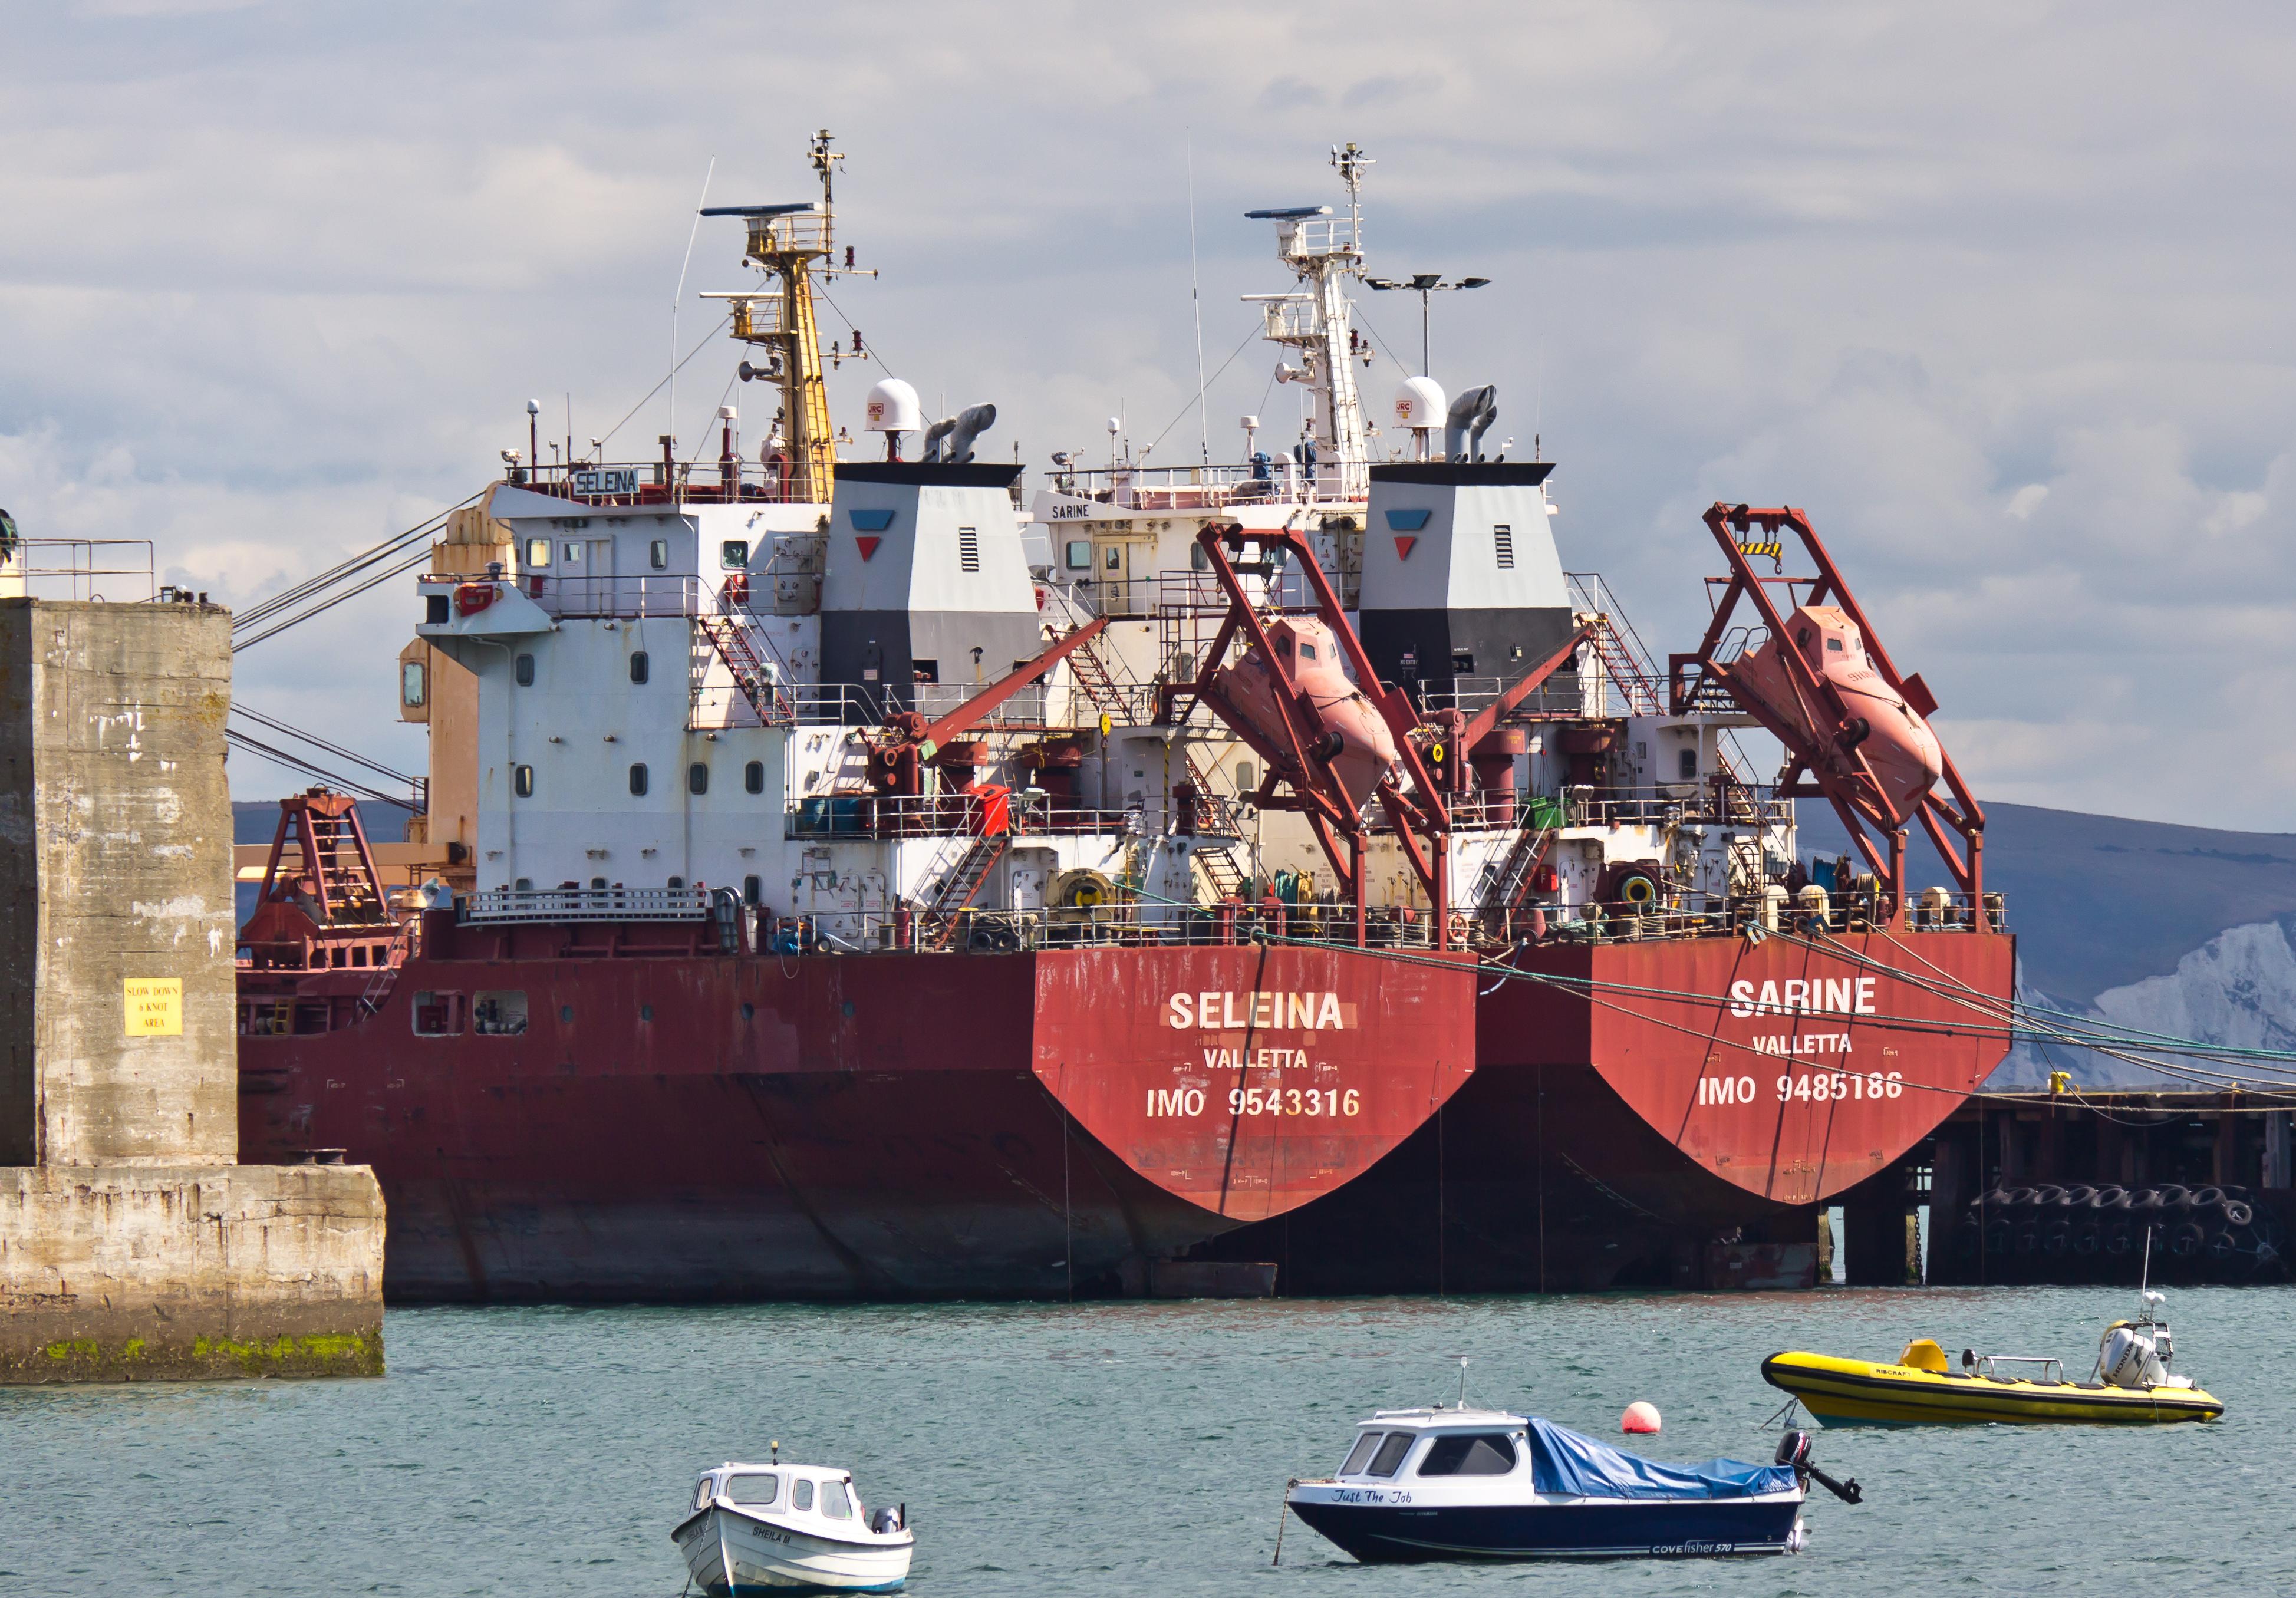 File:Bulk carriers Seleina and Sarine in Portland Harbour-9438 jpg